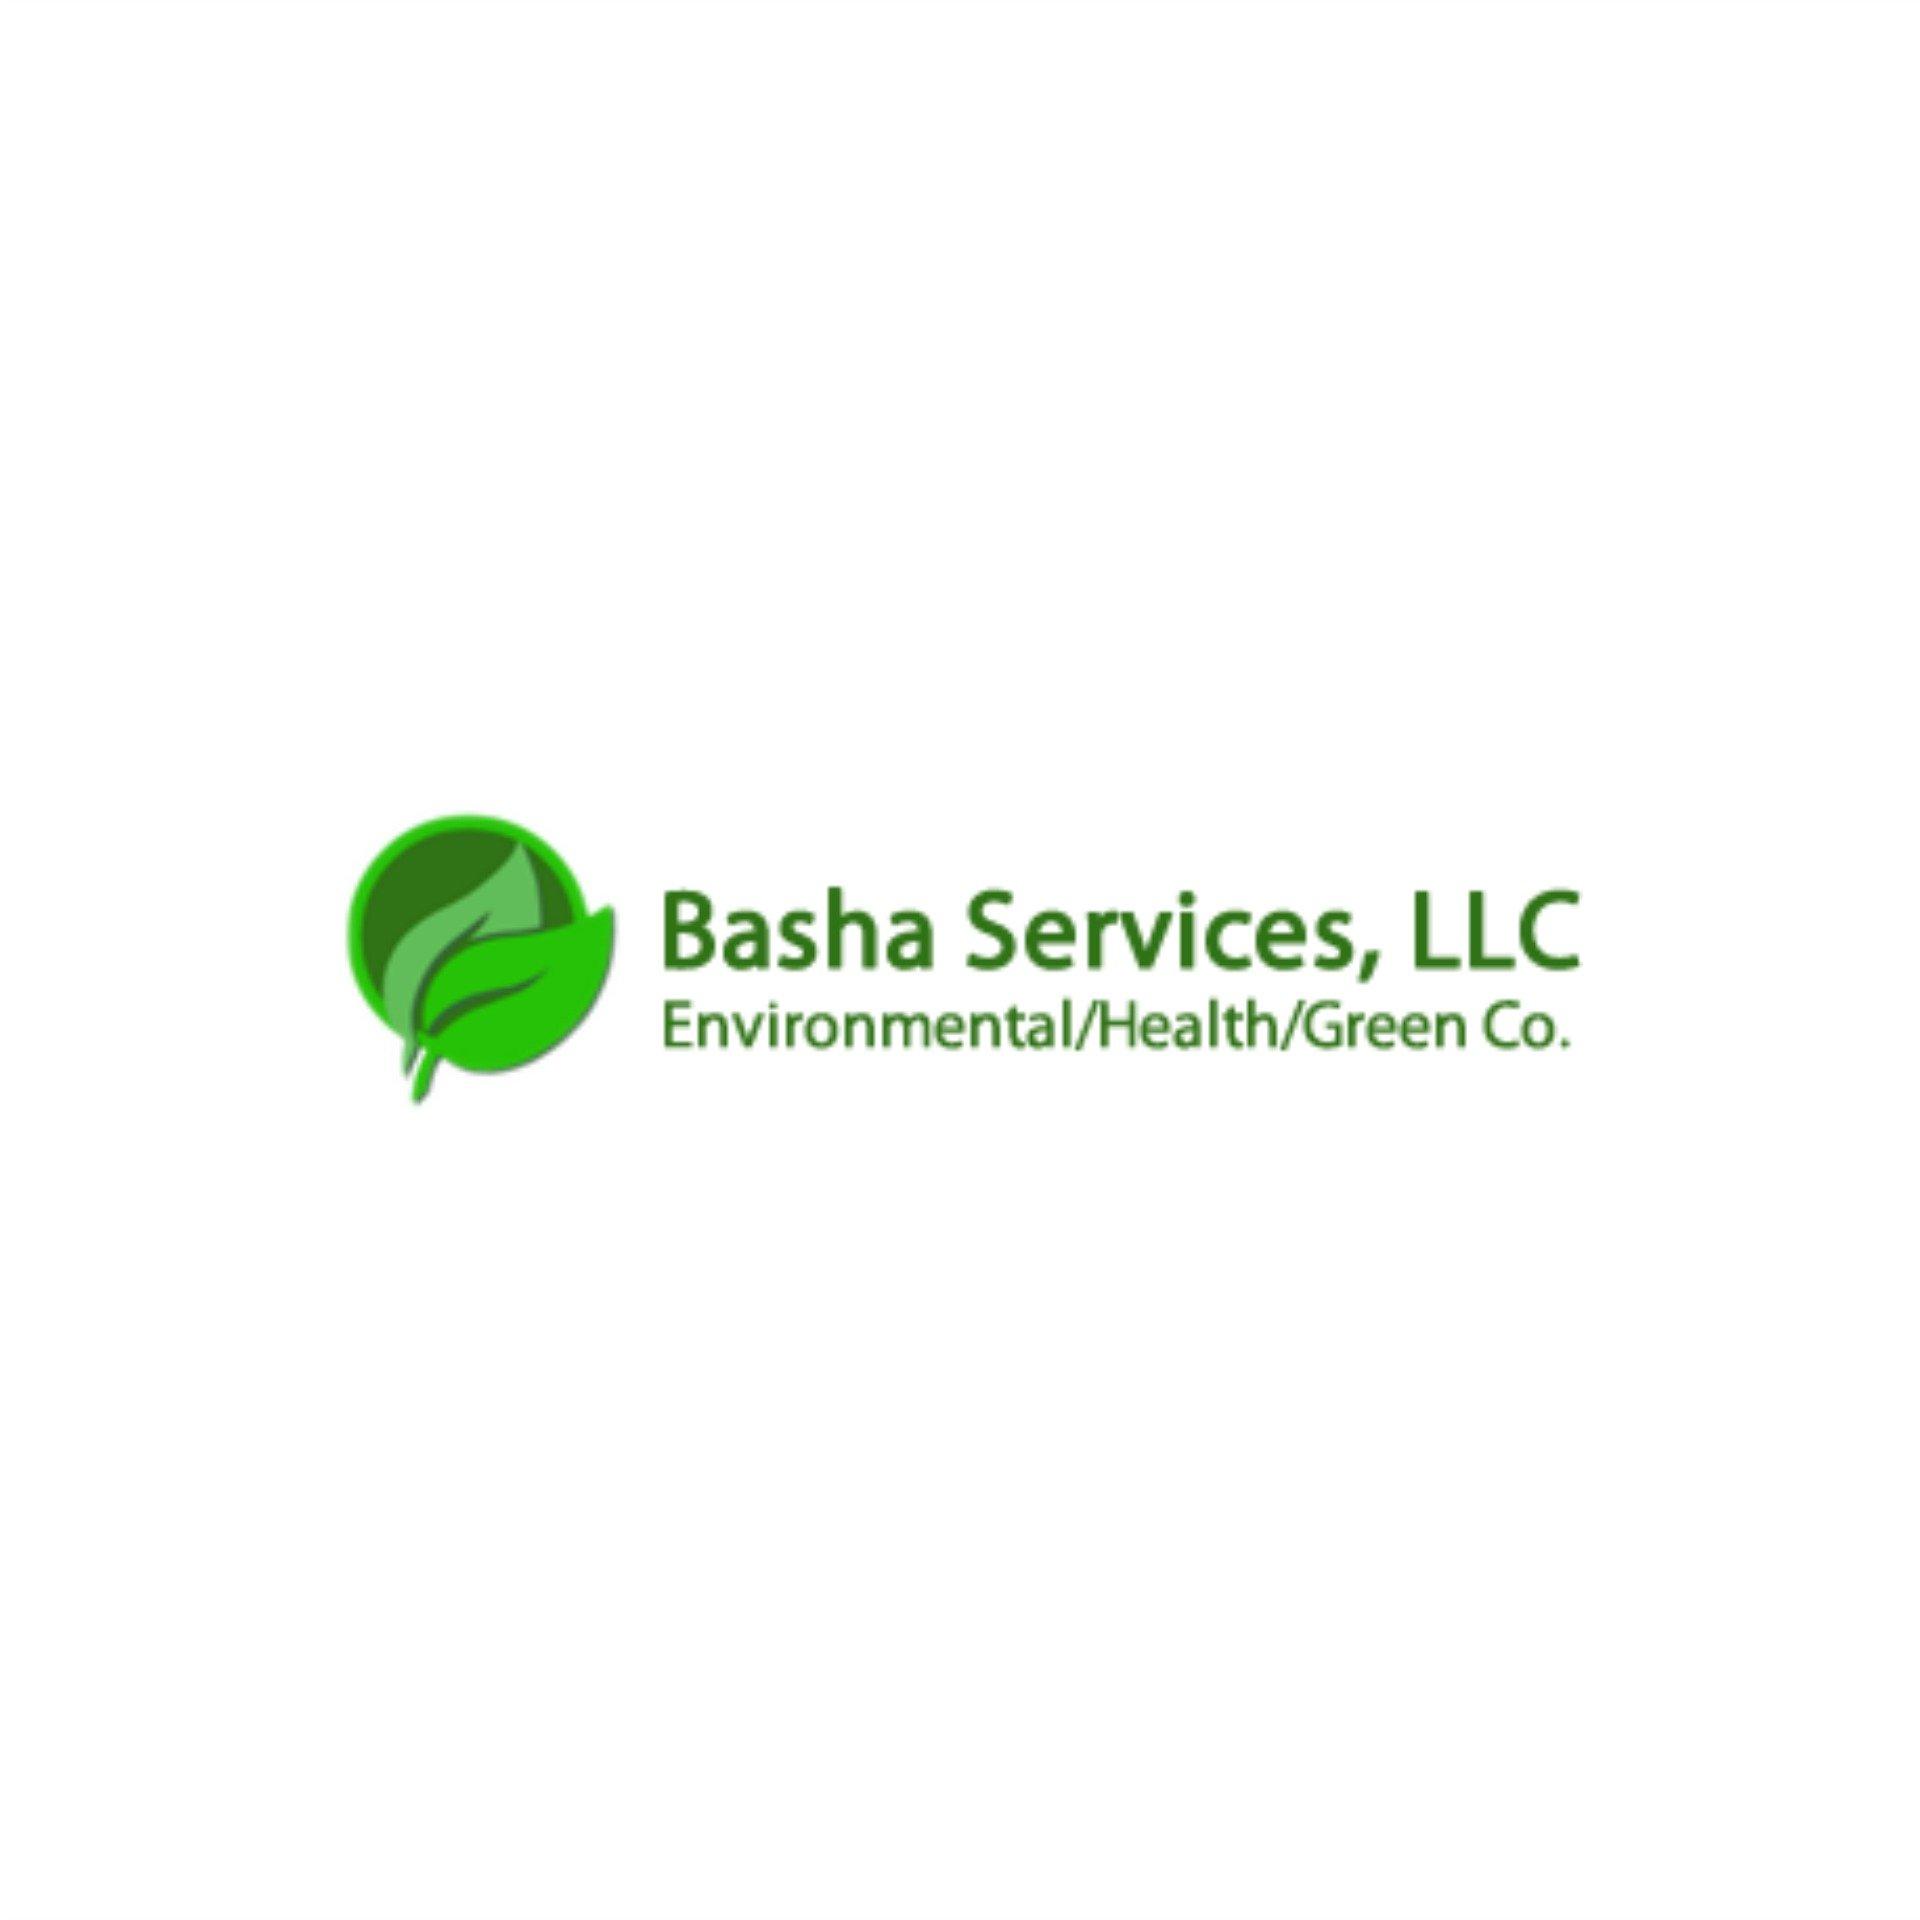 Basha Services